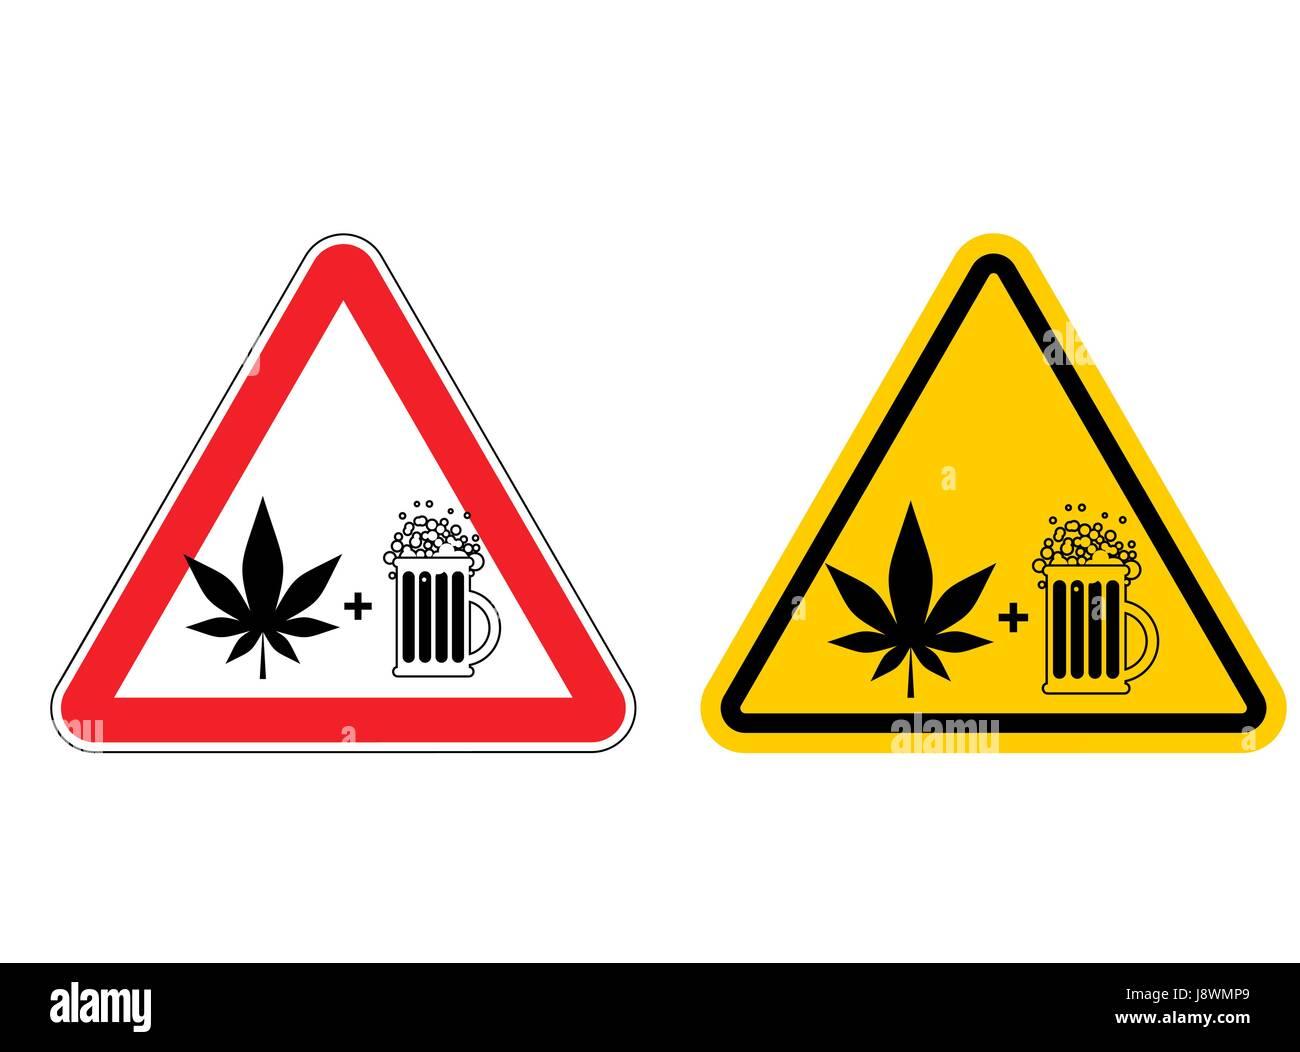 Drogen Warnung